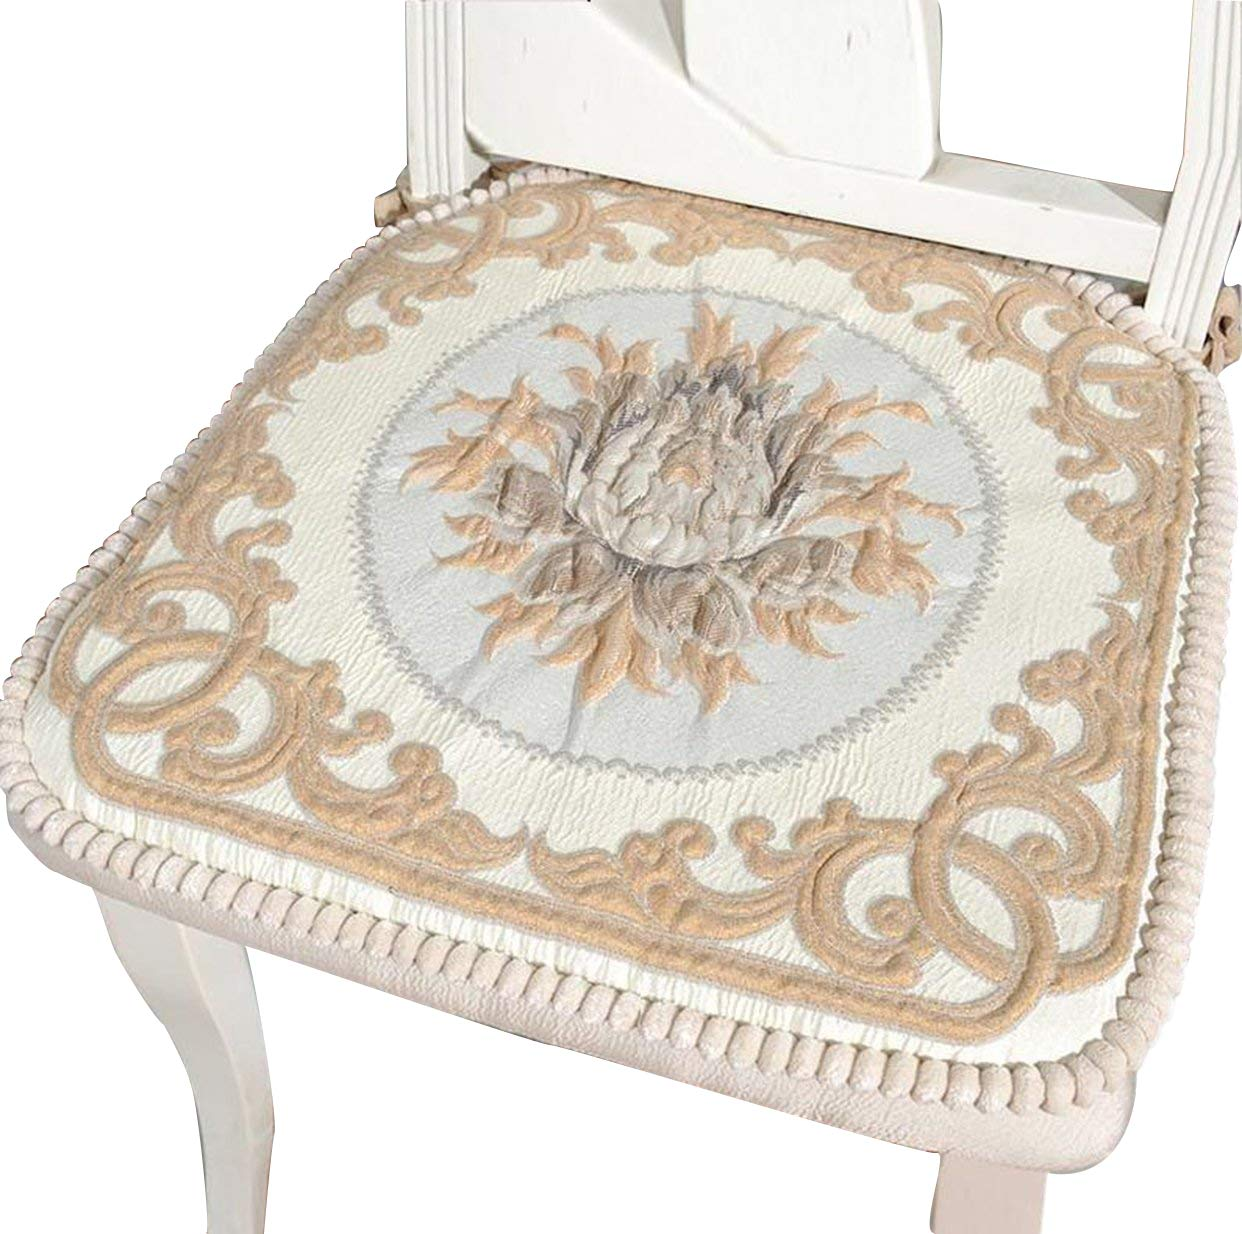 "Sideli Foam Kitchen Chair Pads Non slip 16""x16"" - Set of 2,(2, COLOR1) Haomengde"